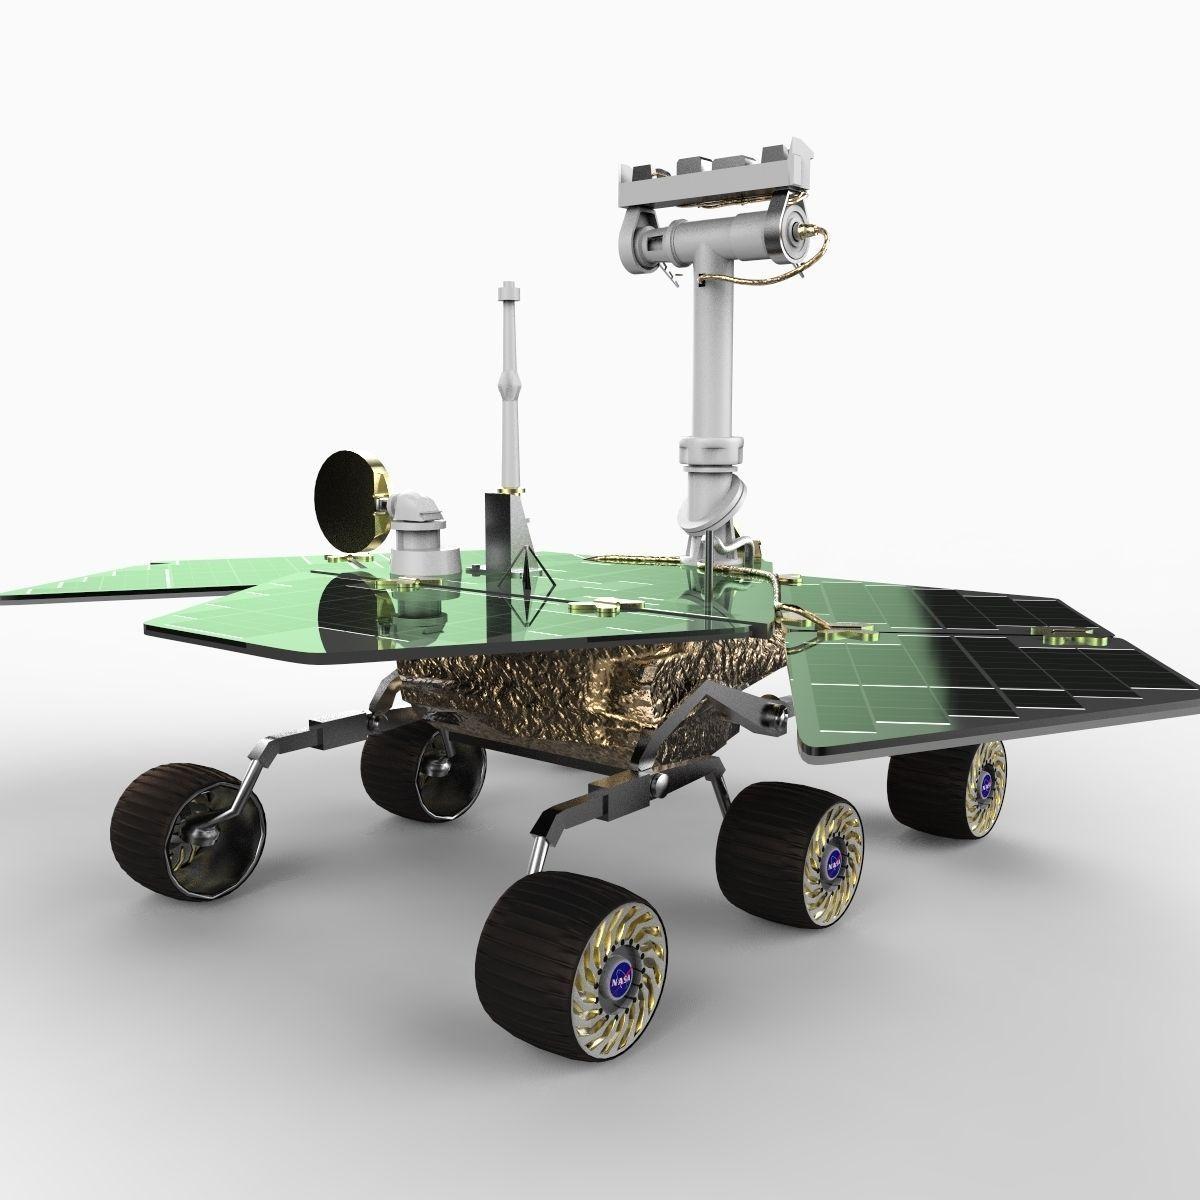 spirit rover model - photo #7